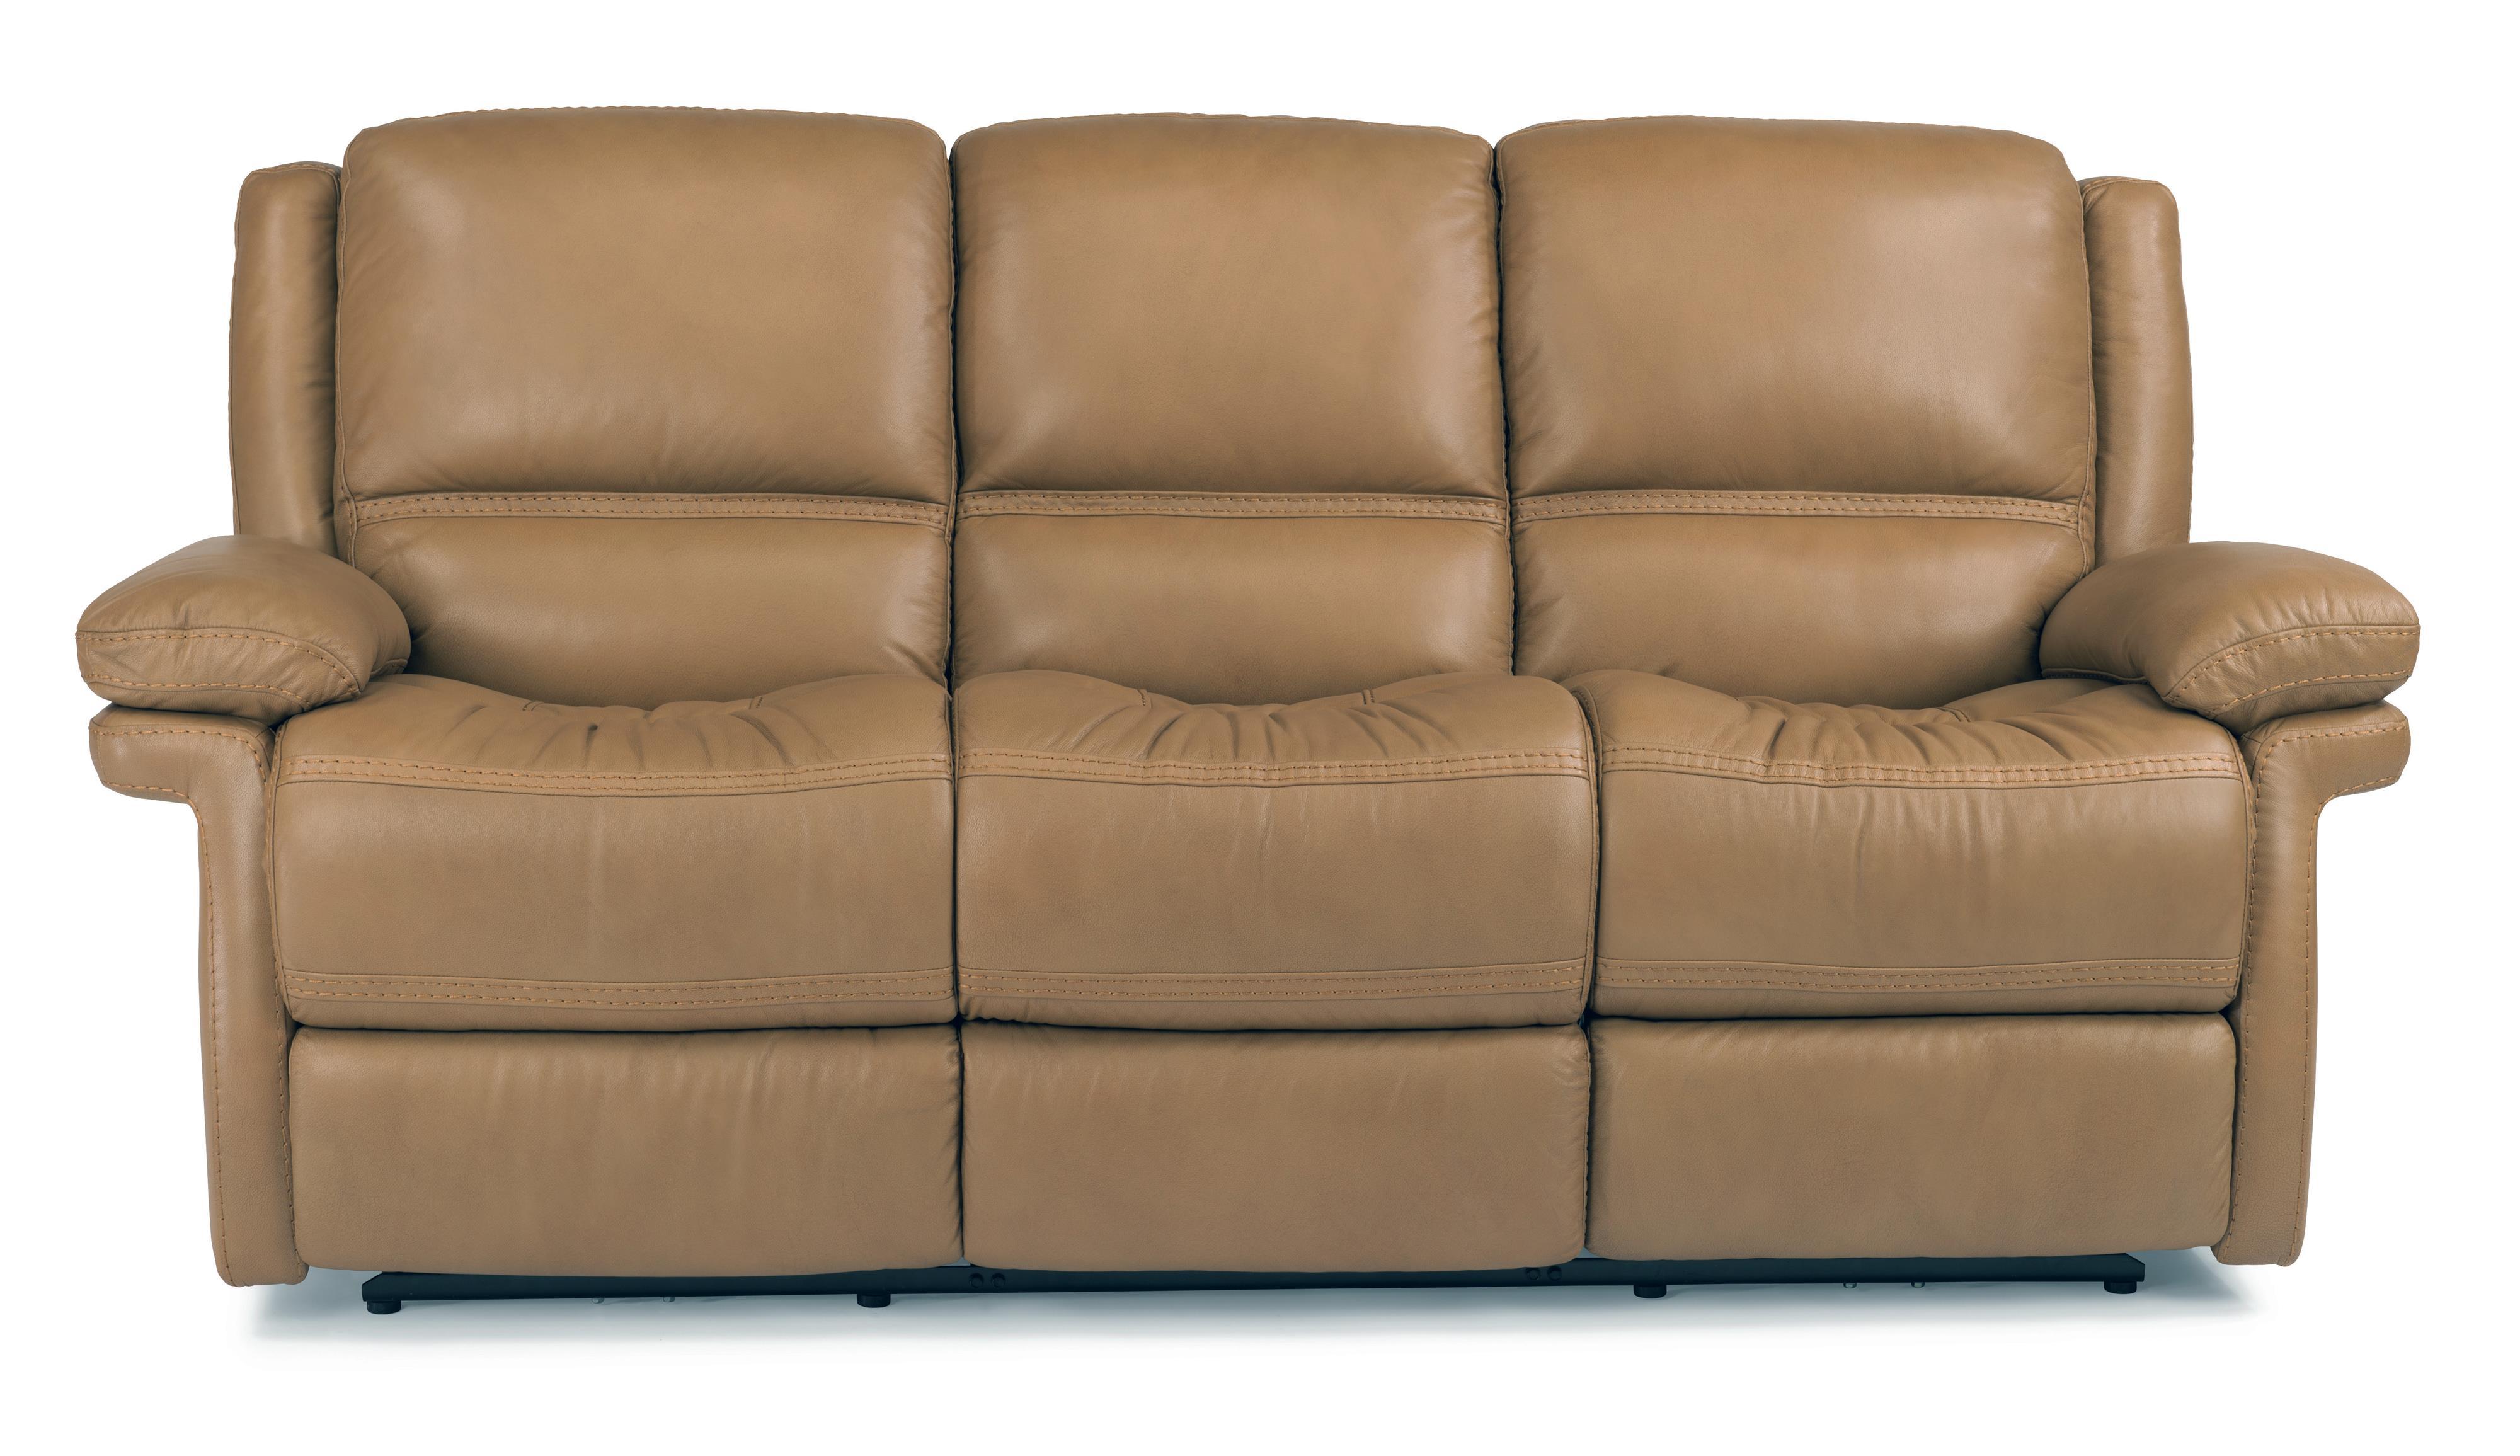 Flexsteel Latitudes - Skyler Power Reclining Sofa - Item Number: 1655-62P-029-80